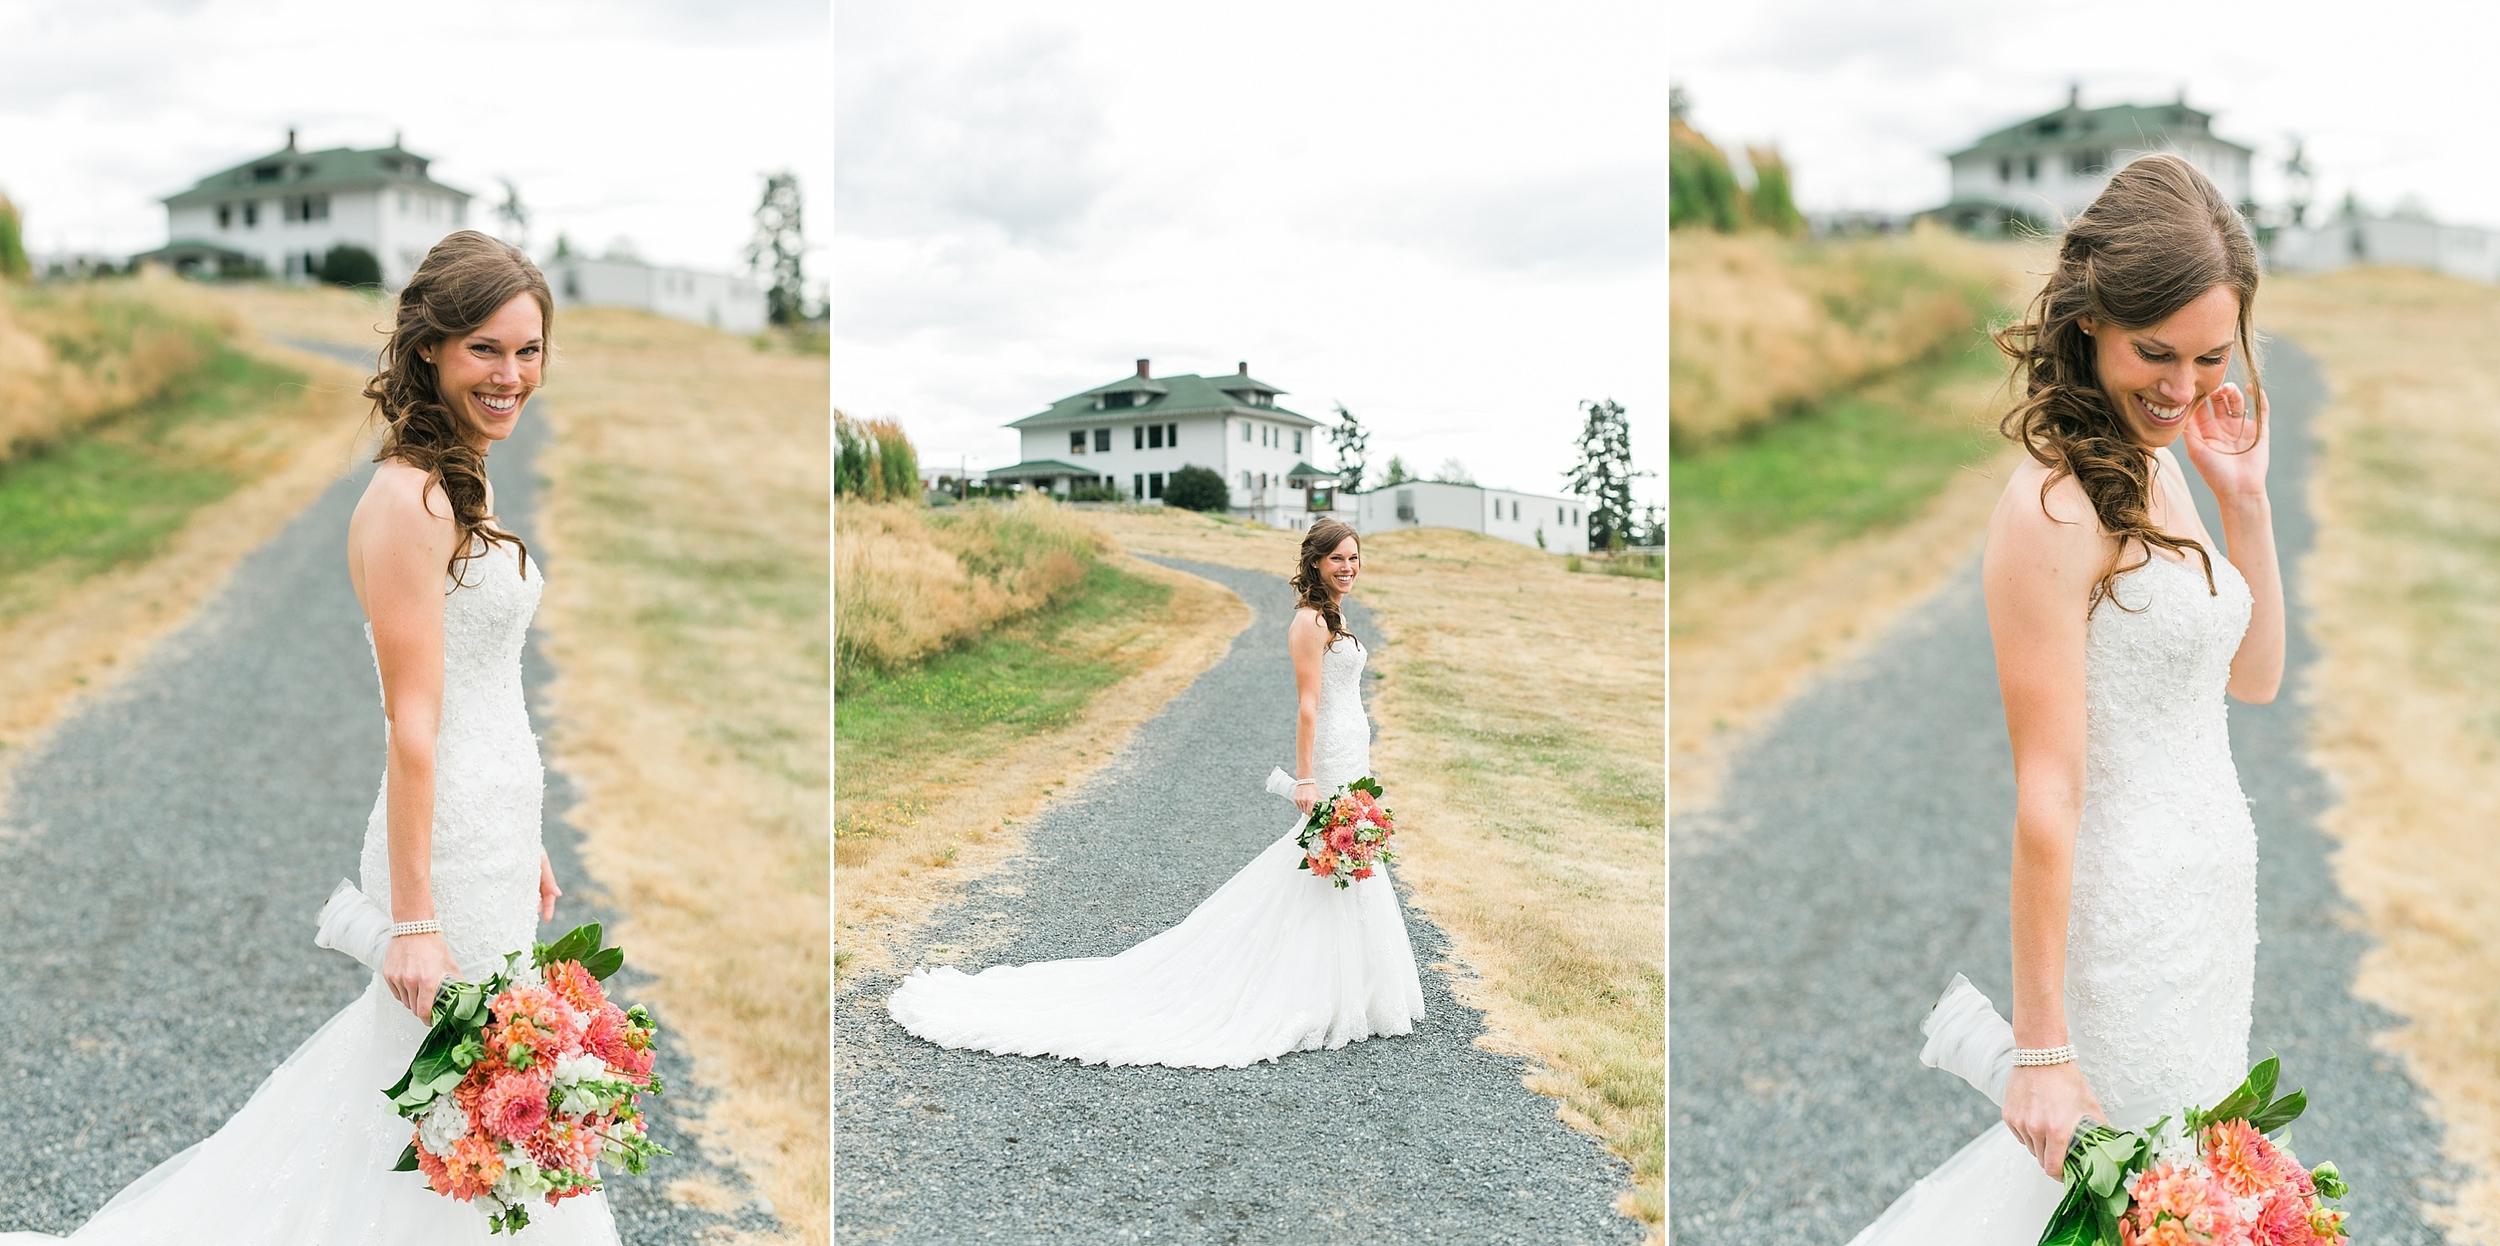 ashley vos photography seattle area wedding photographer_0654.jpg